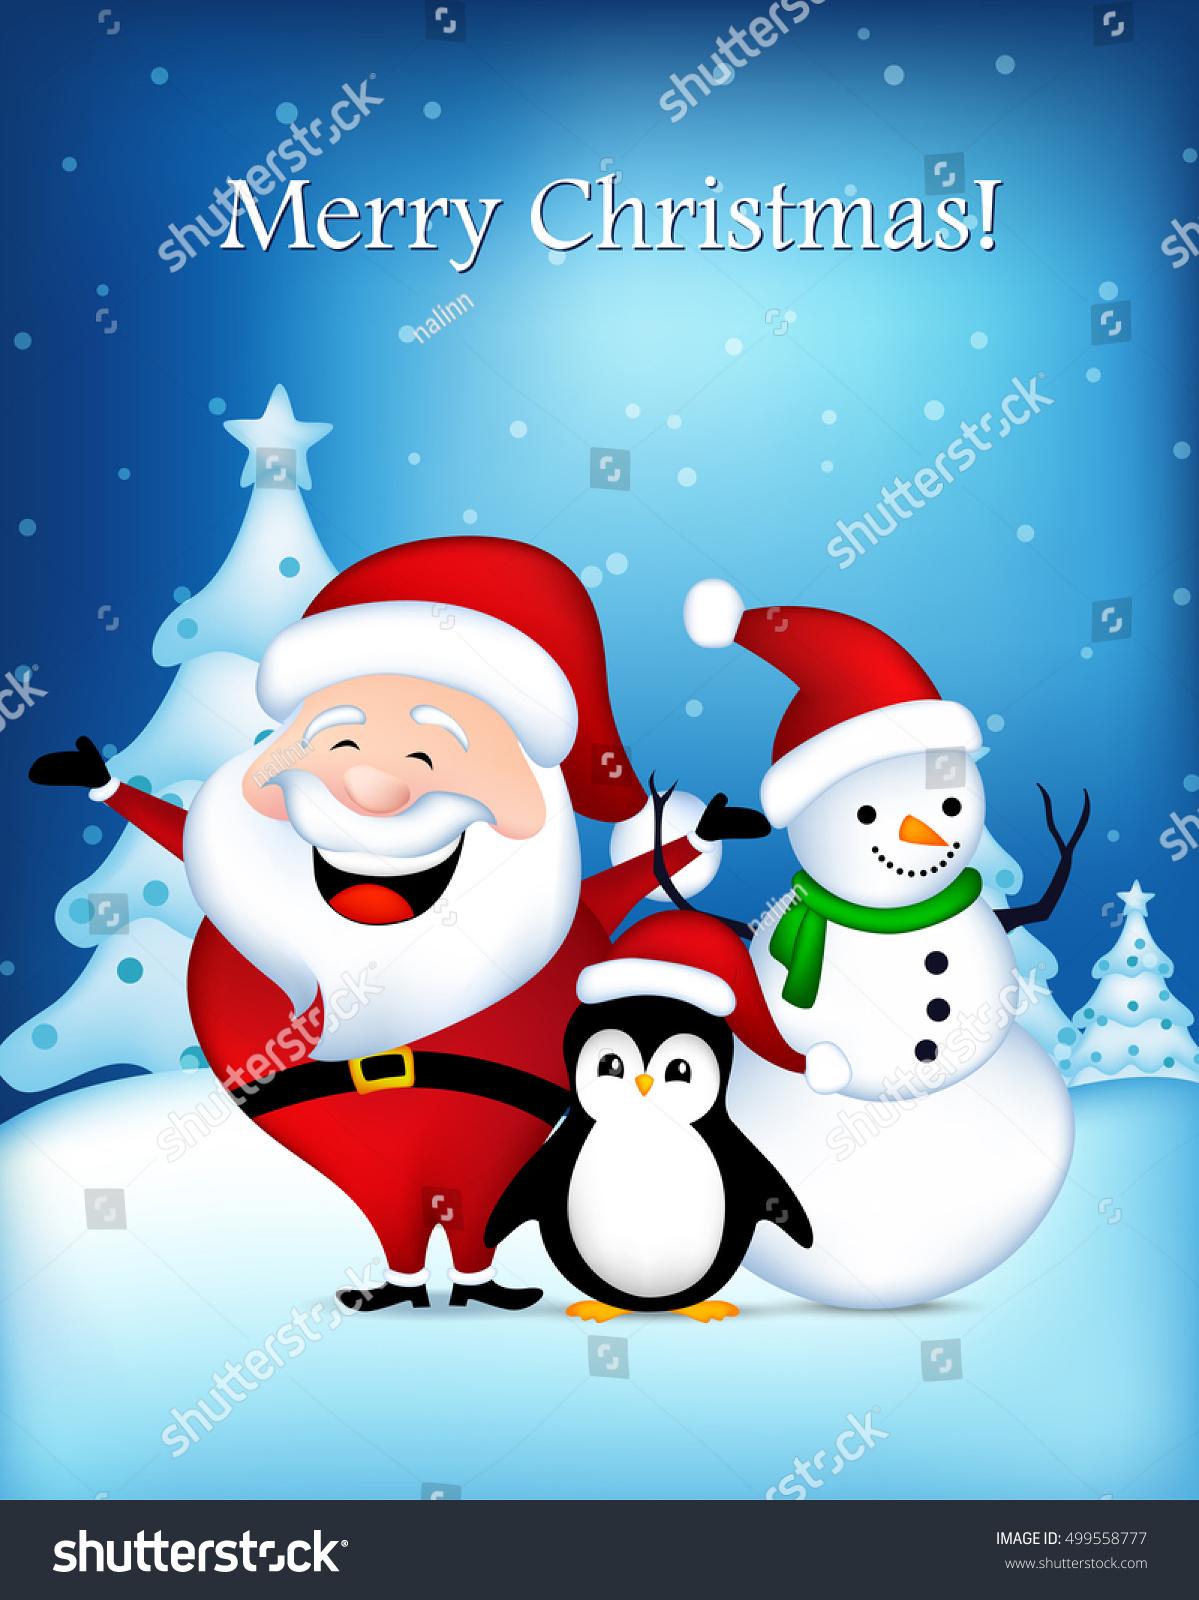 Cute Santa Claus Snowman Penguin Wishing Stock Vector Royalty Free